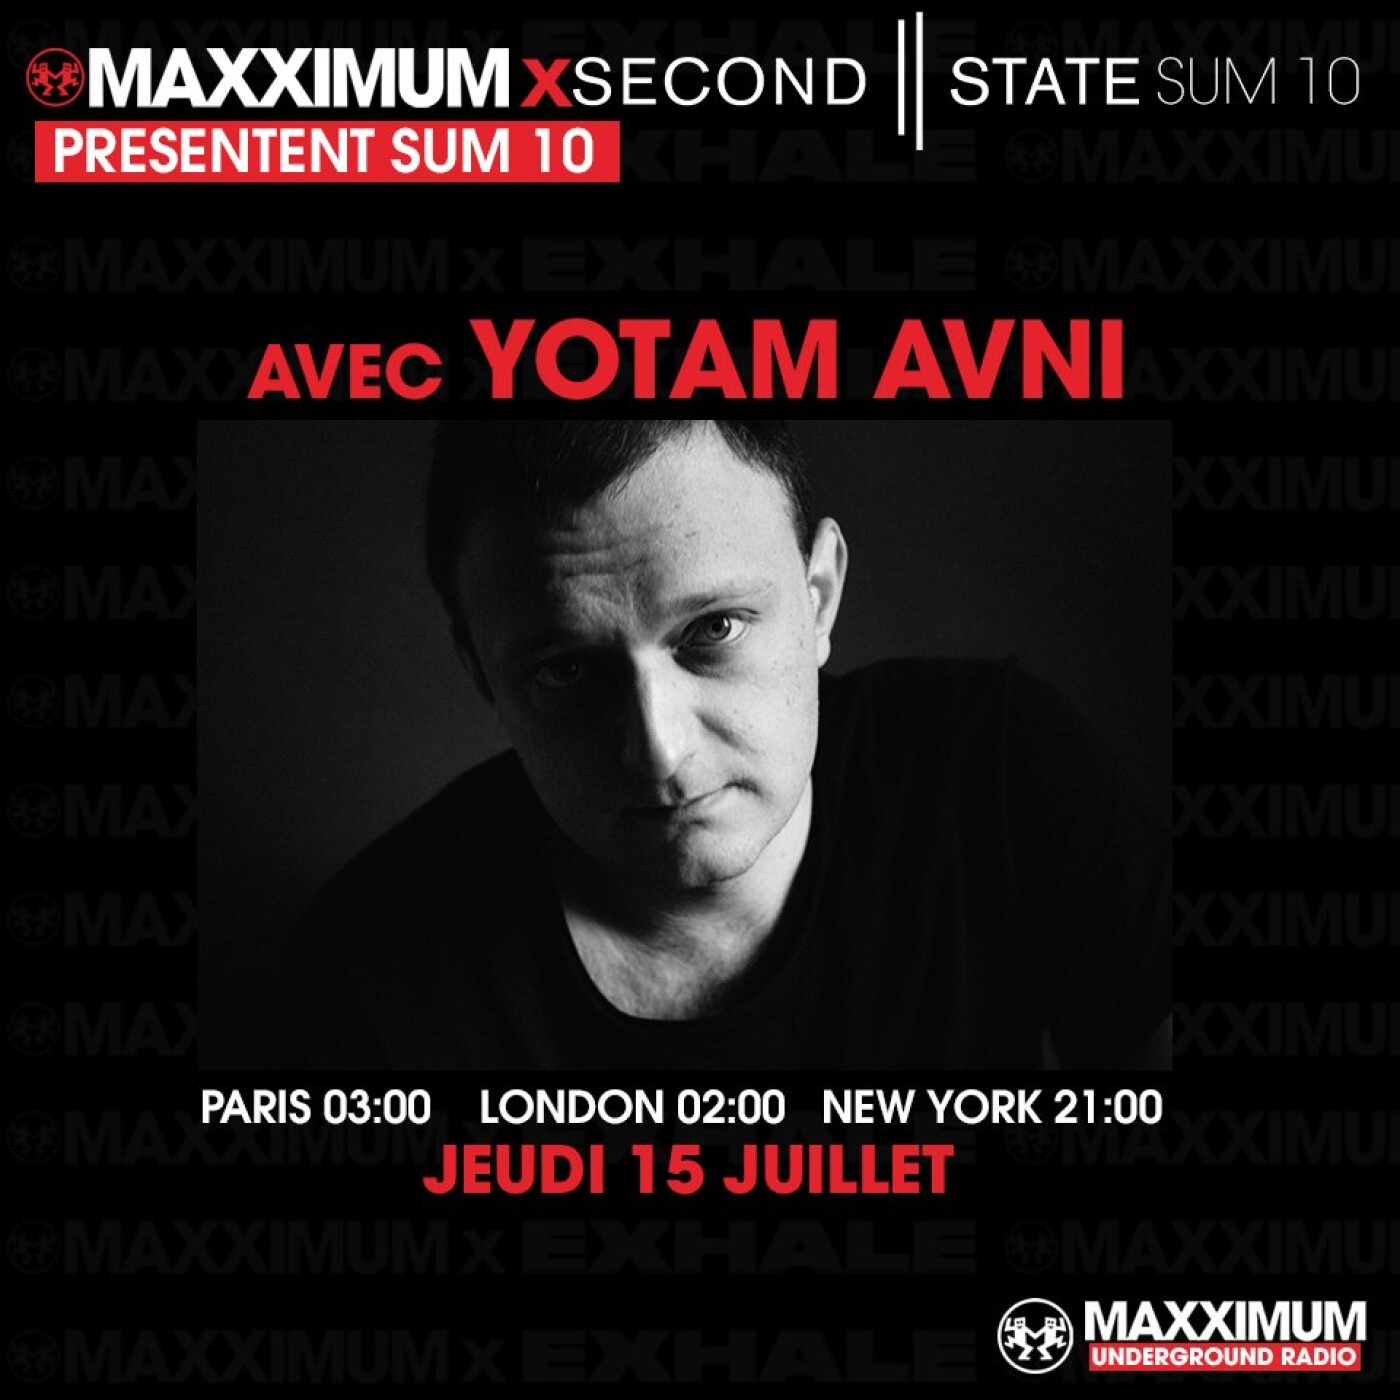 MAXXIMUM INVITE SECOND STATE : YOTAM AVNI